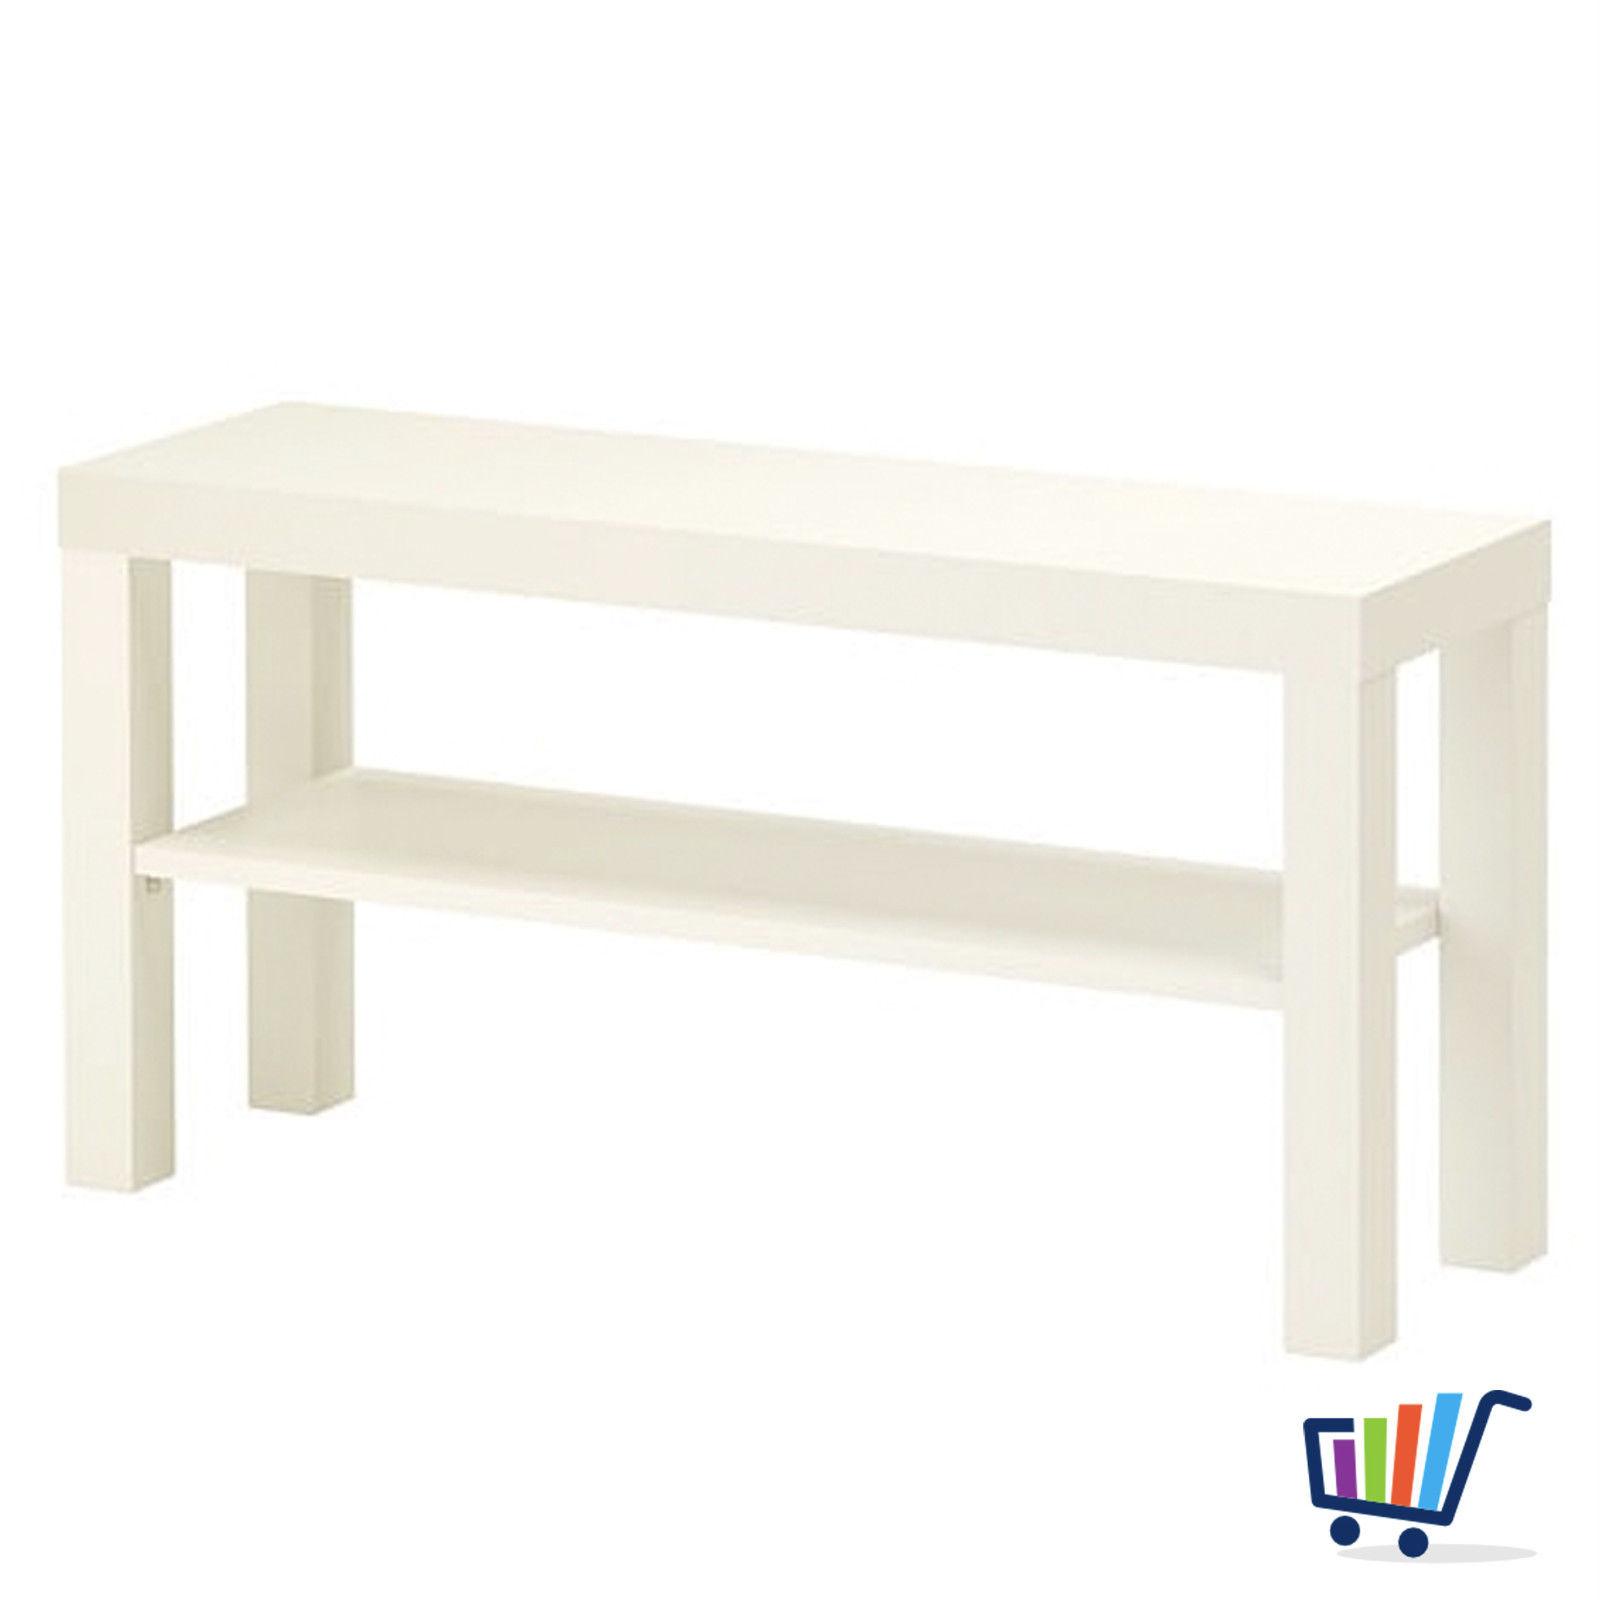 ikea lack tv-bank weiß 90×26 cm fernsehtisch lowboard hifi regal